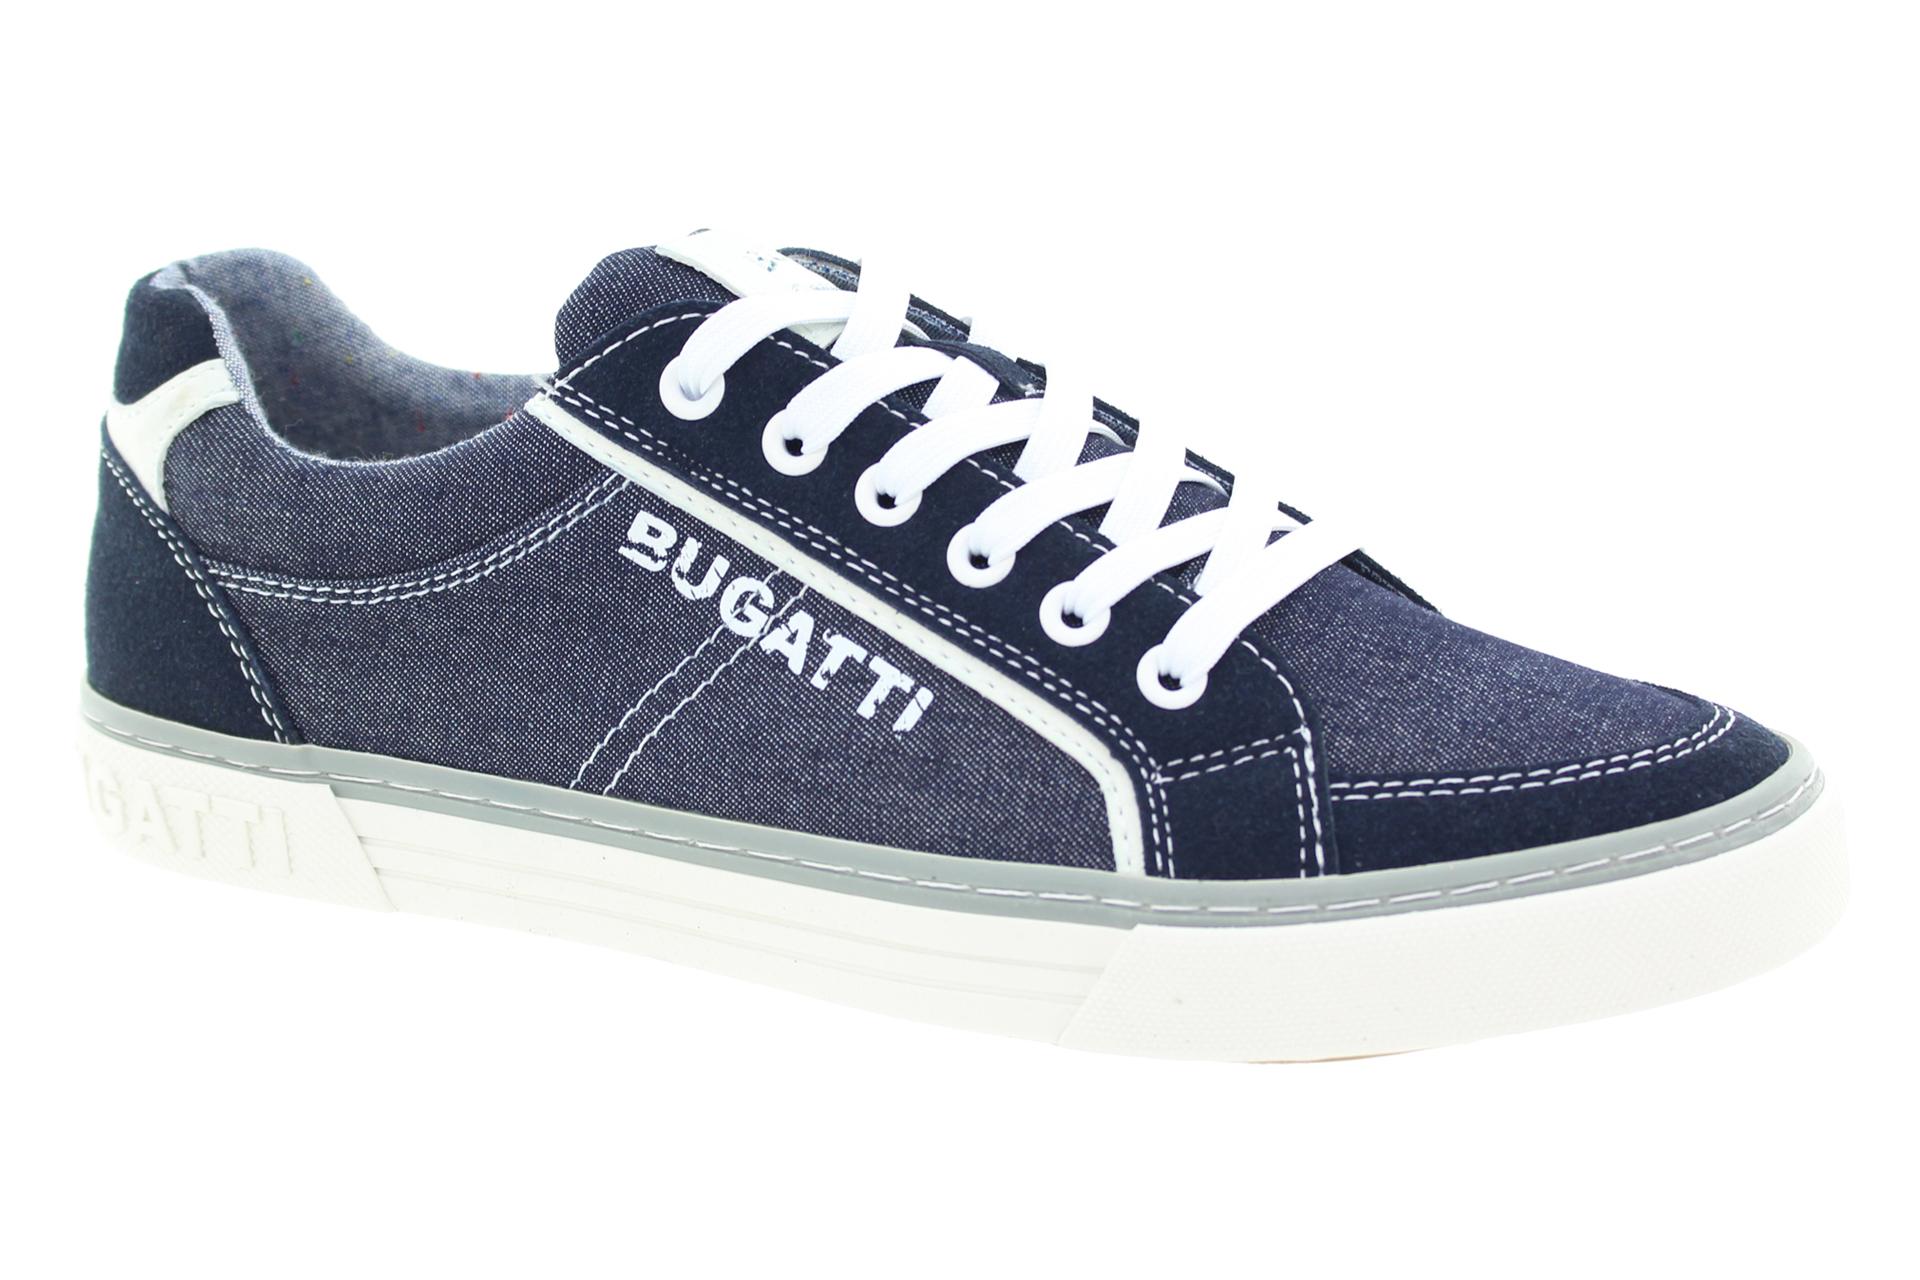 BUGATTI Tenisky pánské dark blue 321 72002 5400 4100 847